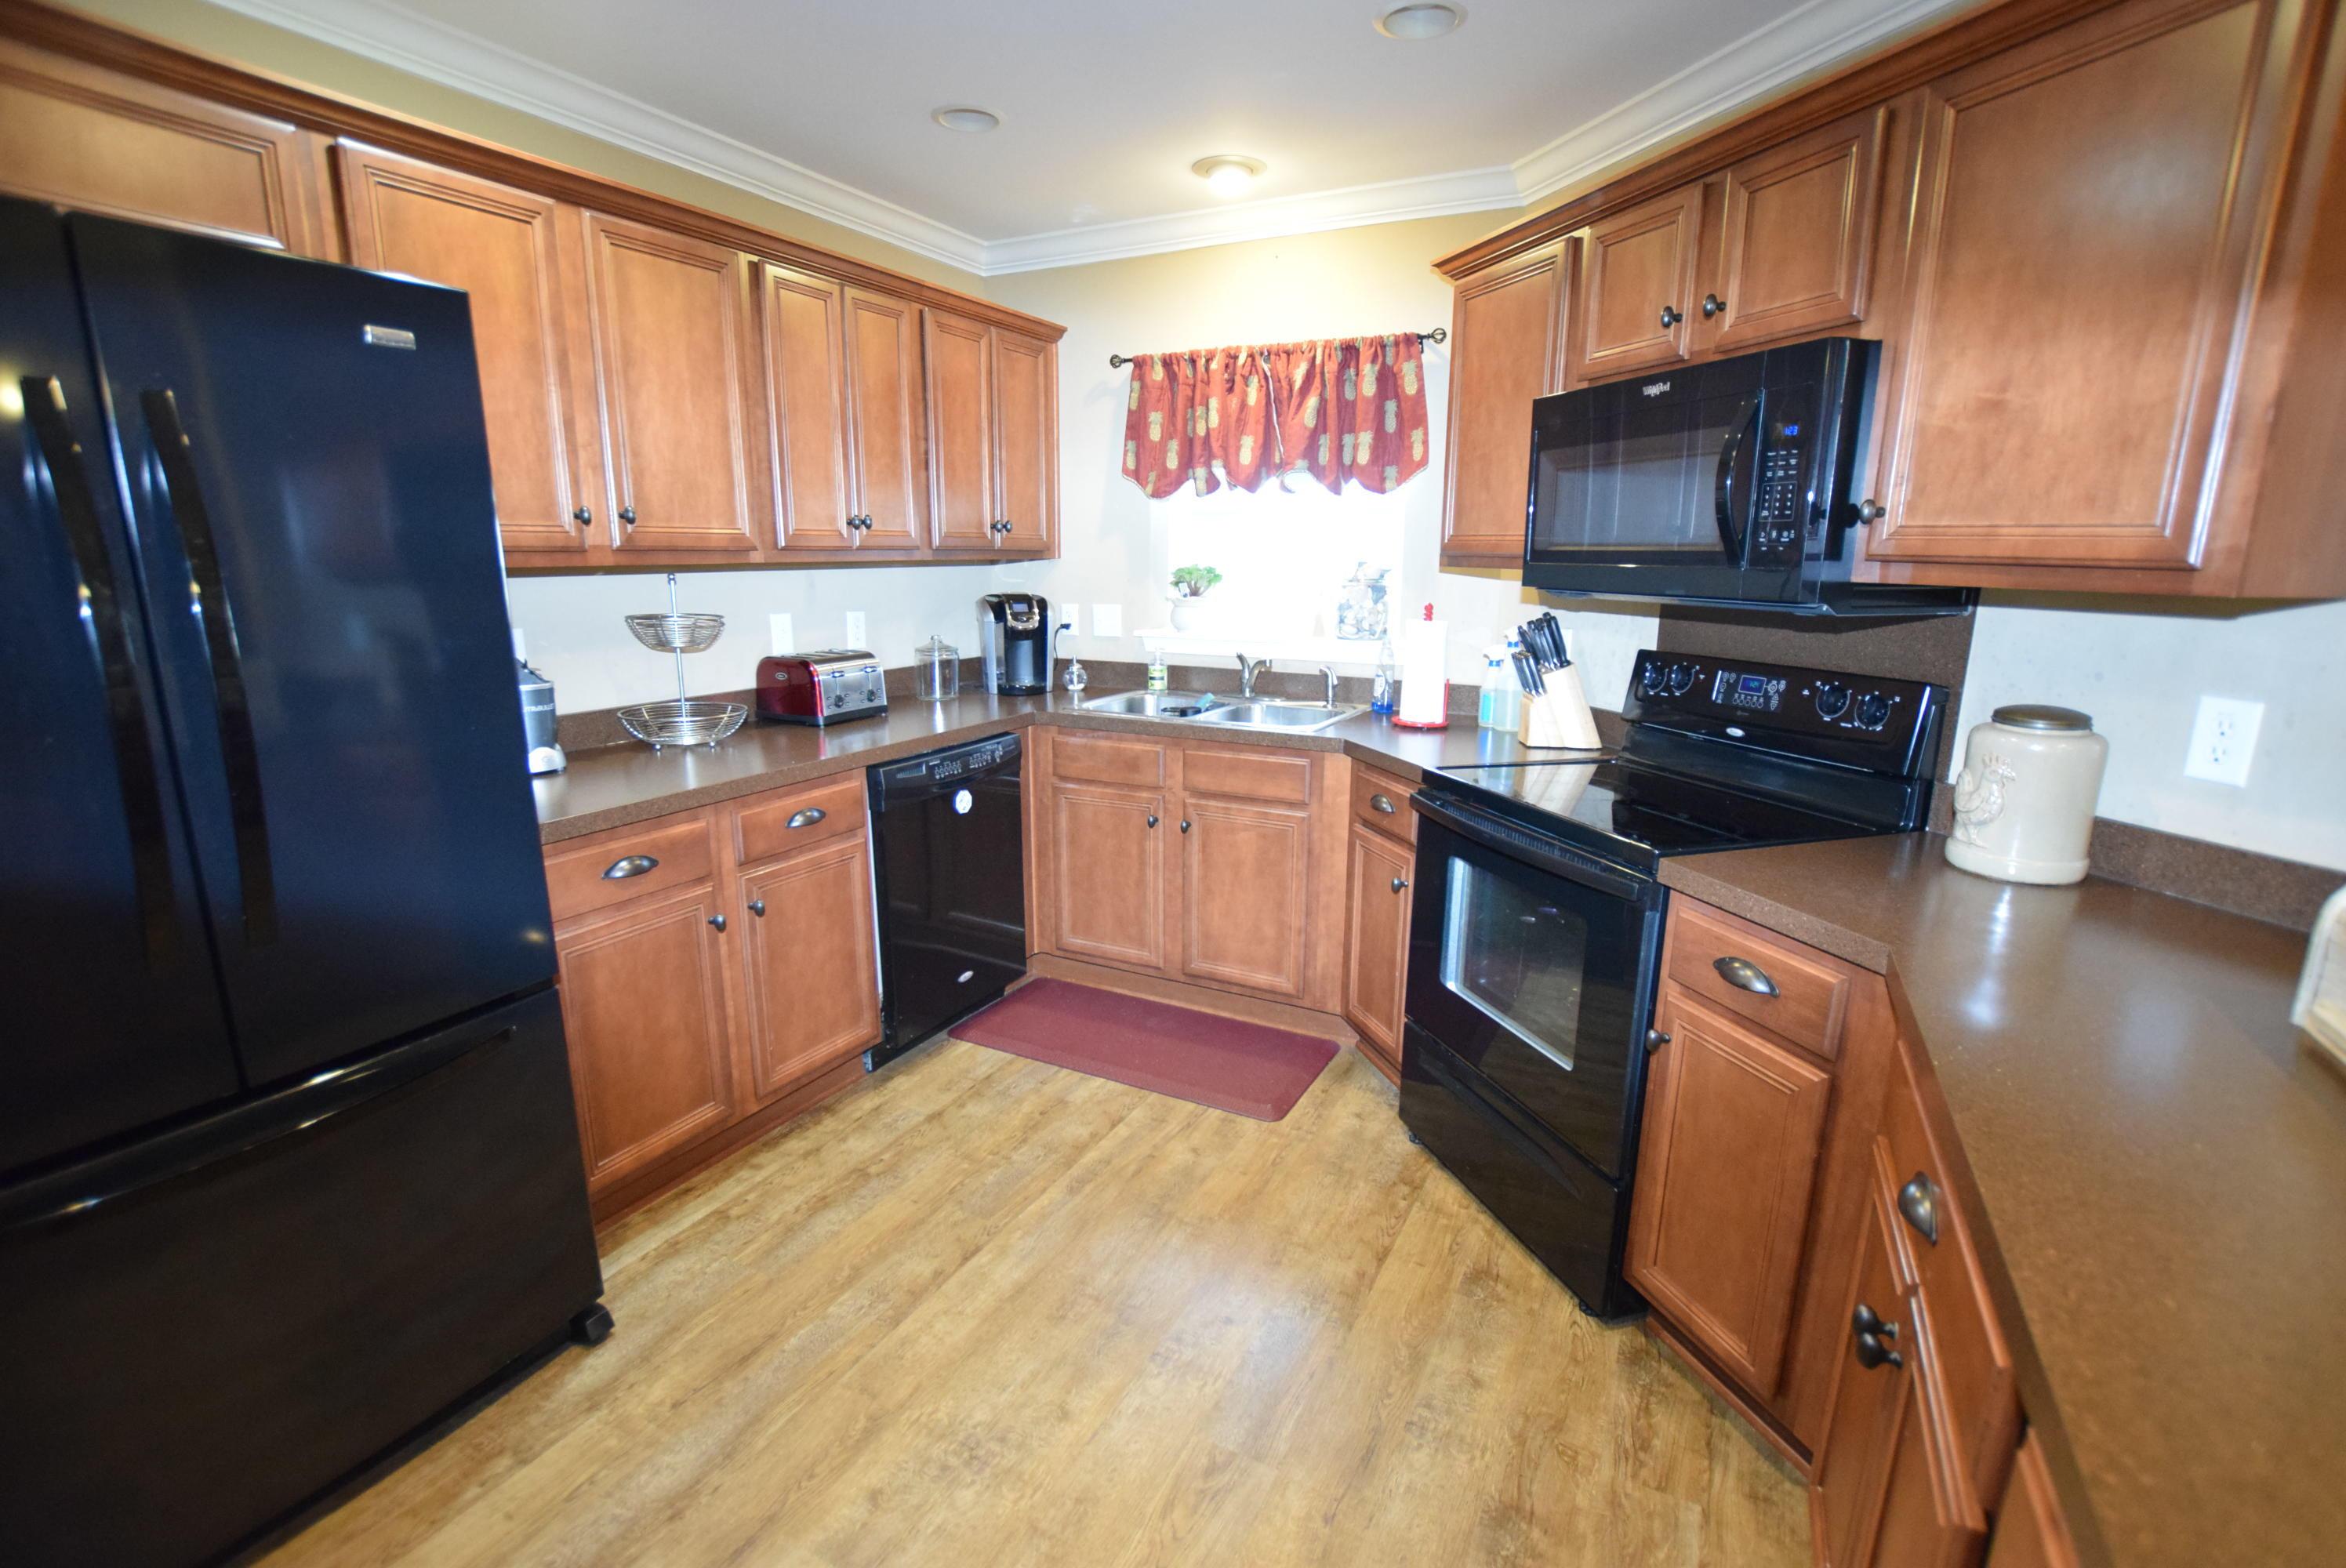 Charleston Park Homes For Sale - 5150 Trump, North Charleston, SC - 11